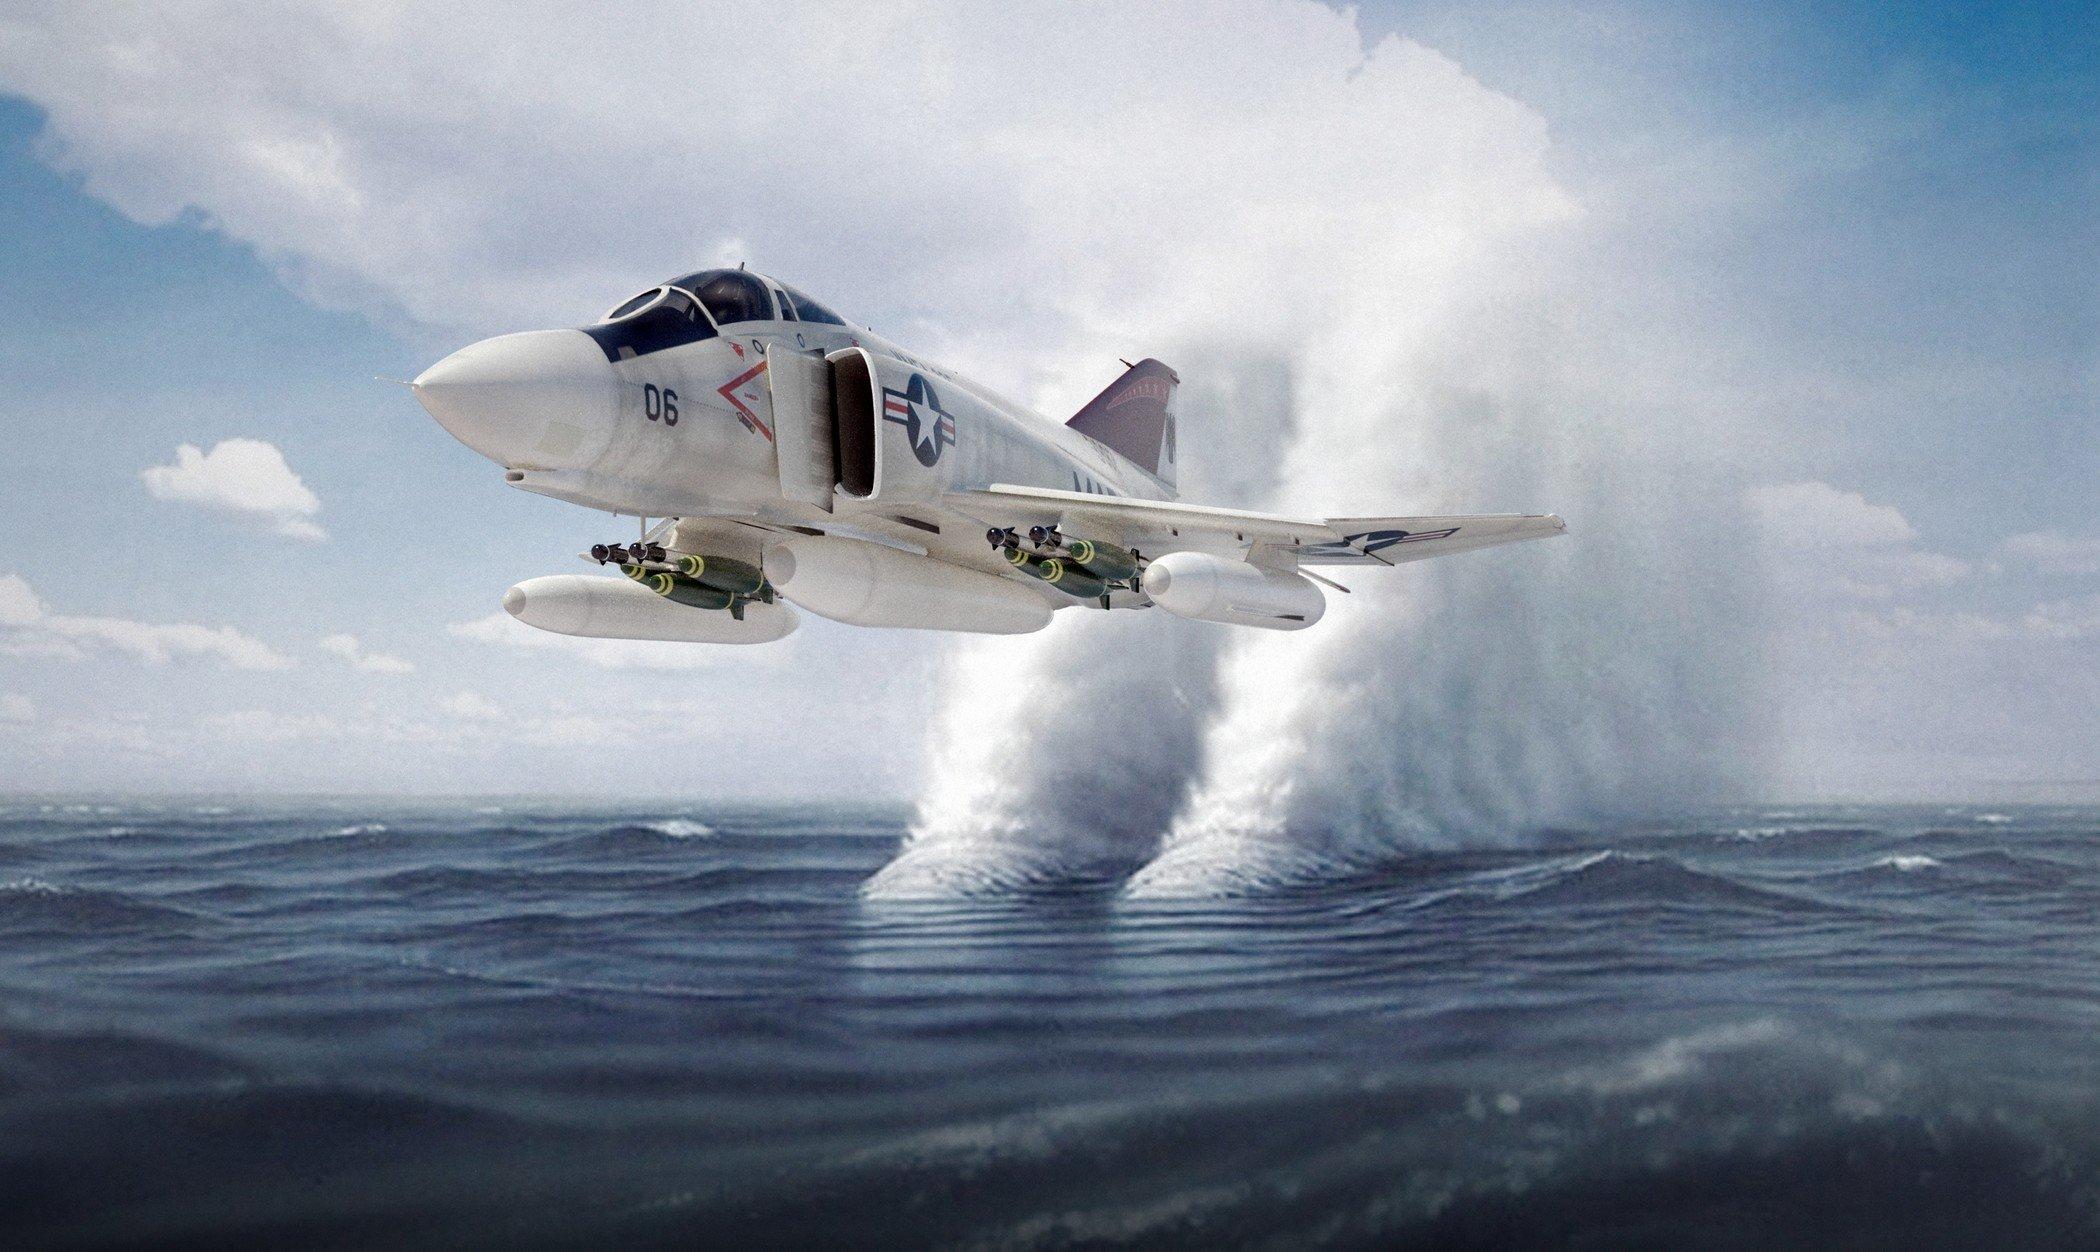 Free Download Mcdonnell Douglas F 4 Phantom Ii Wallpapers Hd